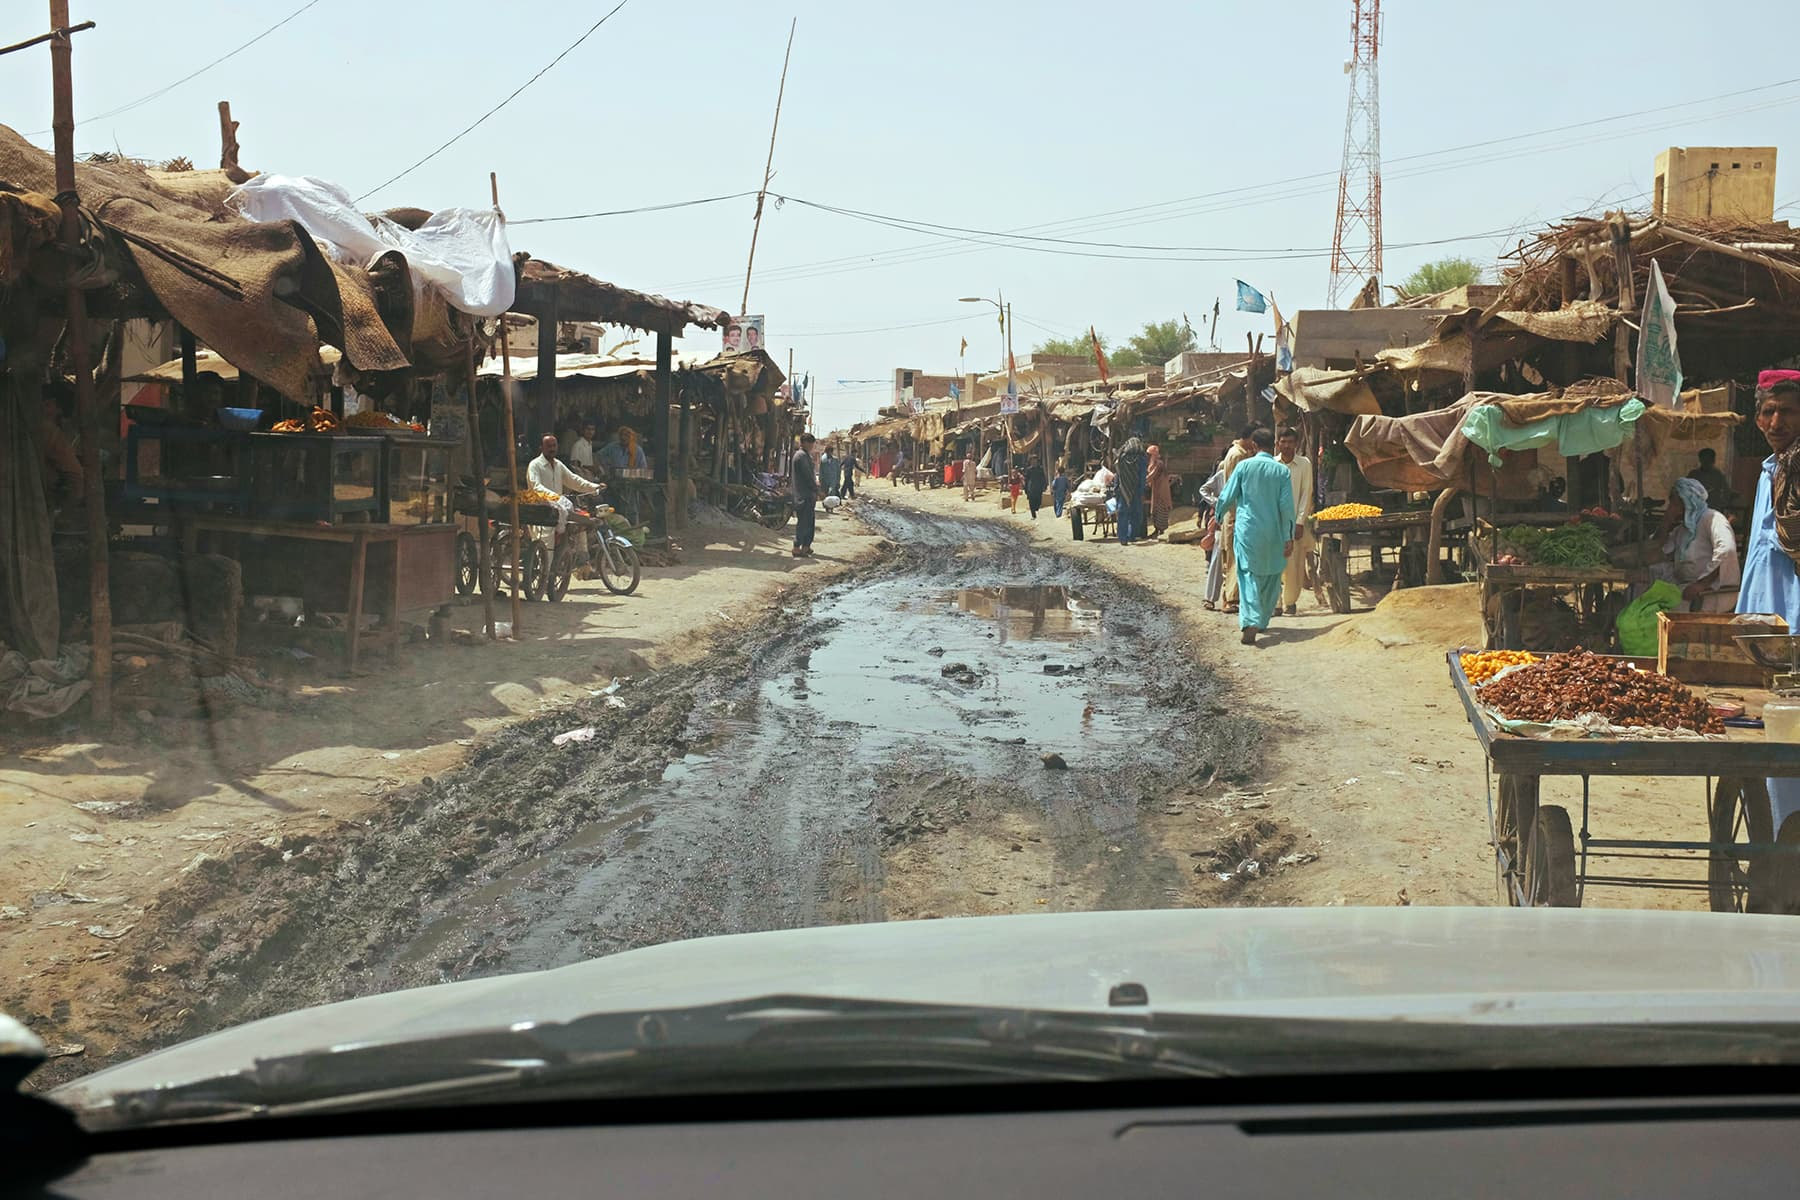 The main street of Wahi Pandi turns into a swamp during monsoon season.